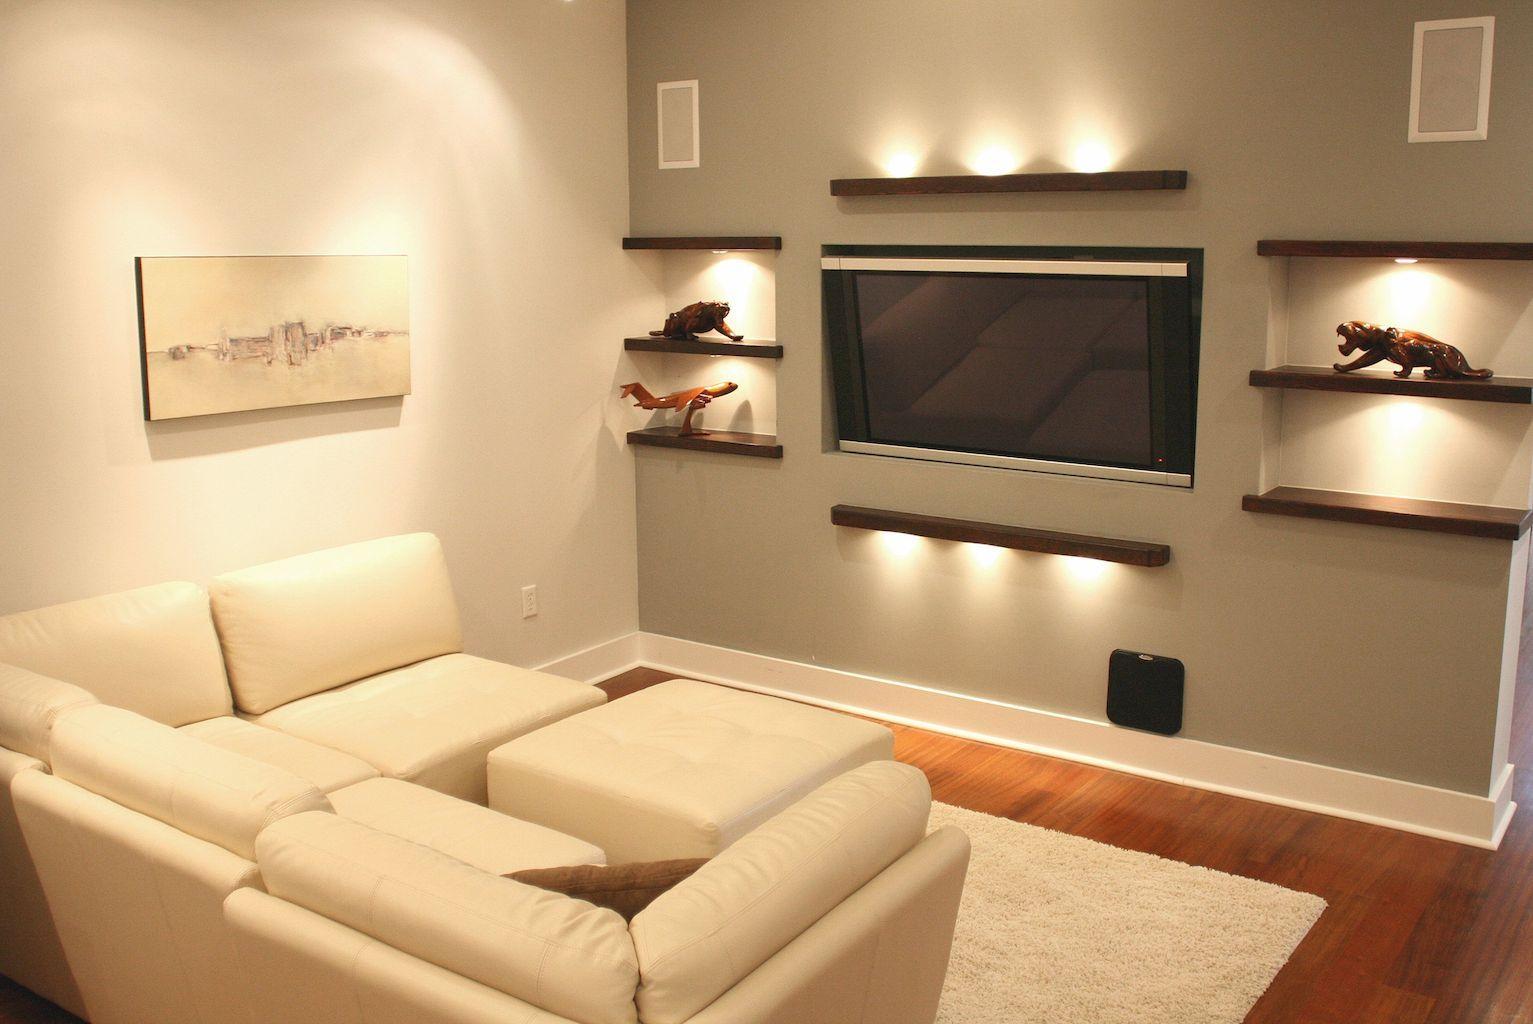 60 TV Wall Living Room Ideas Decor On A Budget | Tv walls, Living ...